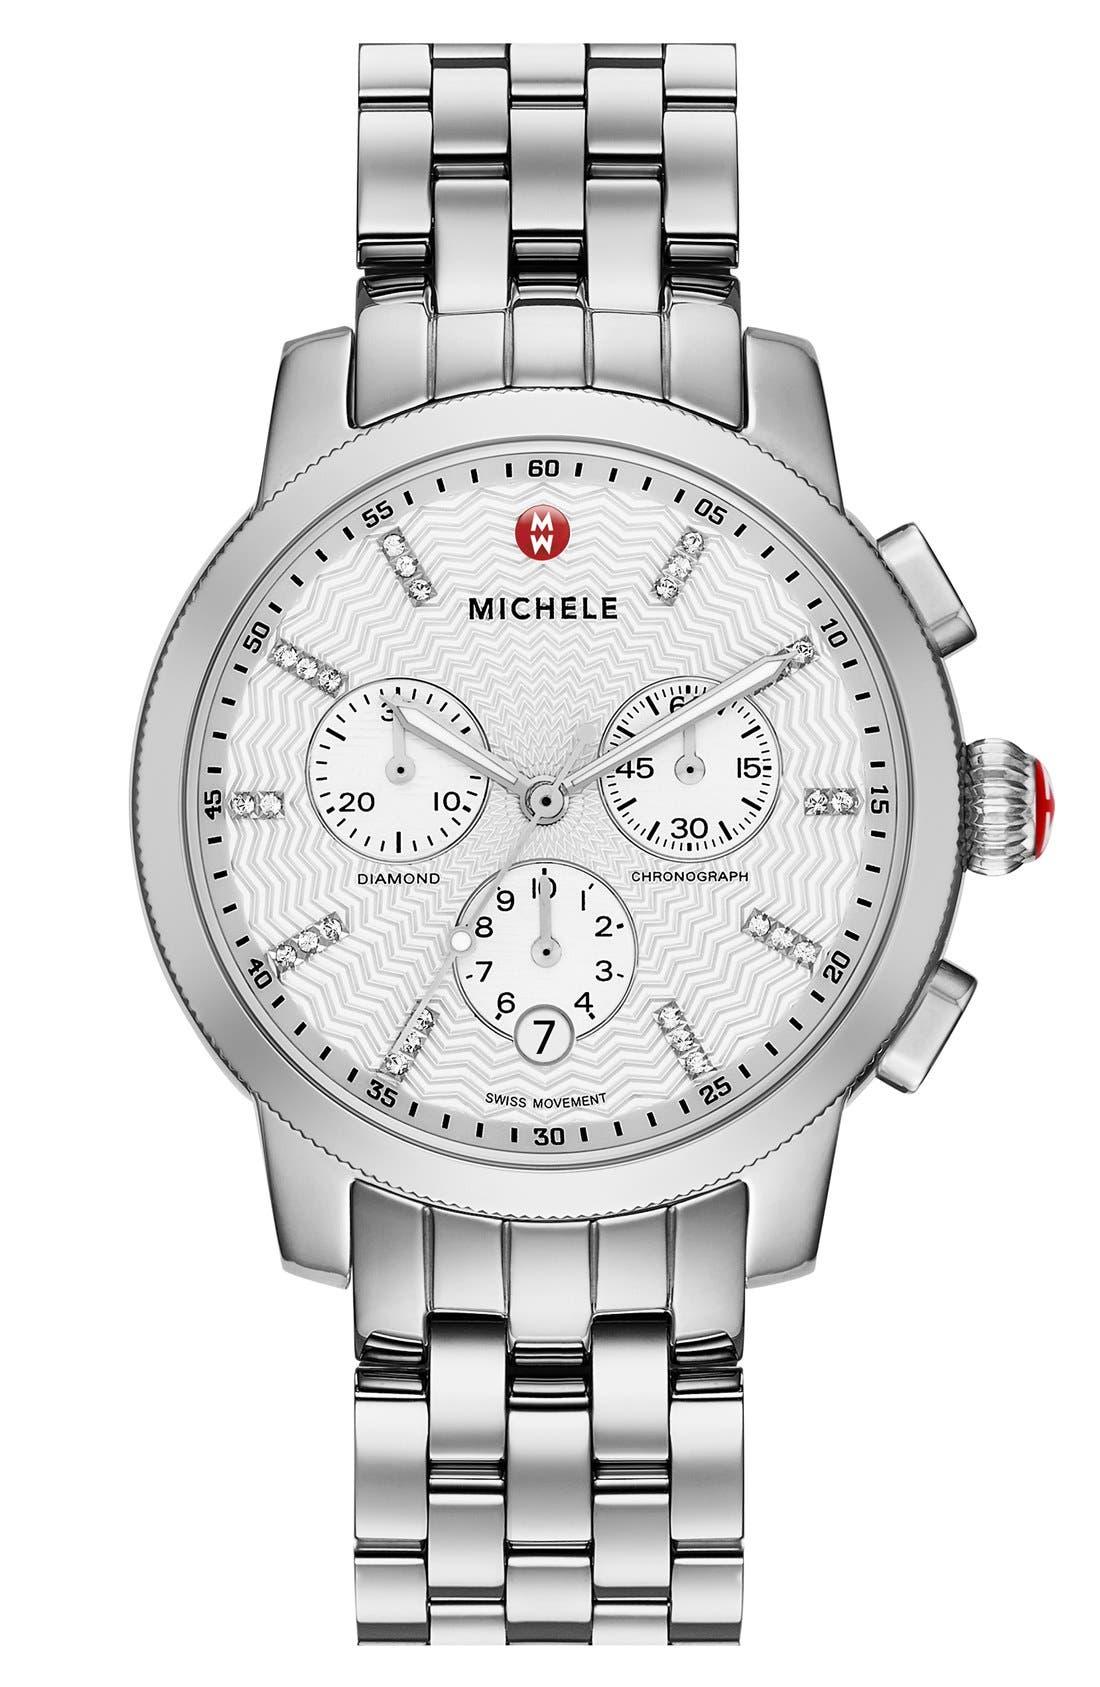 Main Image - MICHELE 'Uptown' Diamond Dial Chronograph Watch Case & Bracelet, 39mm